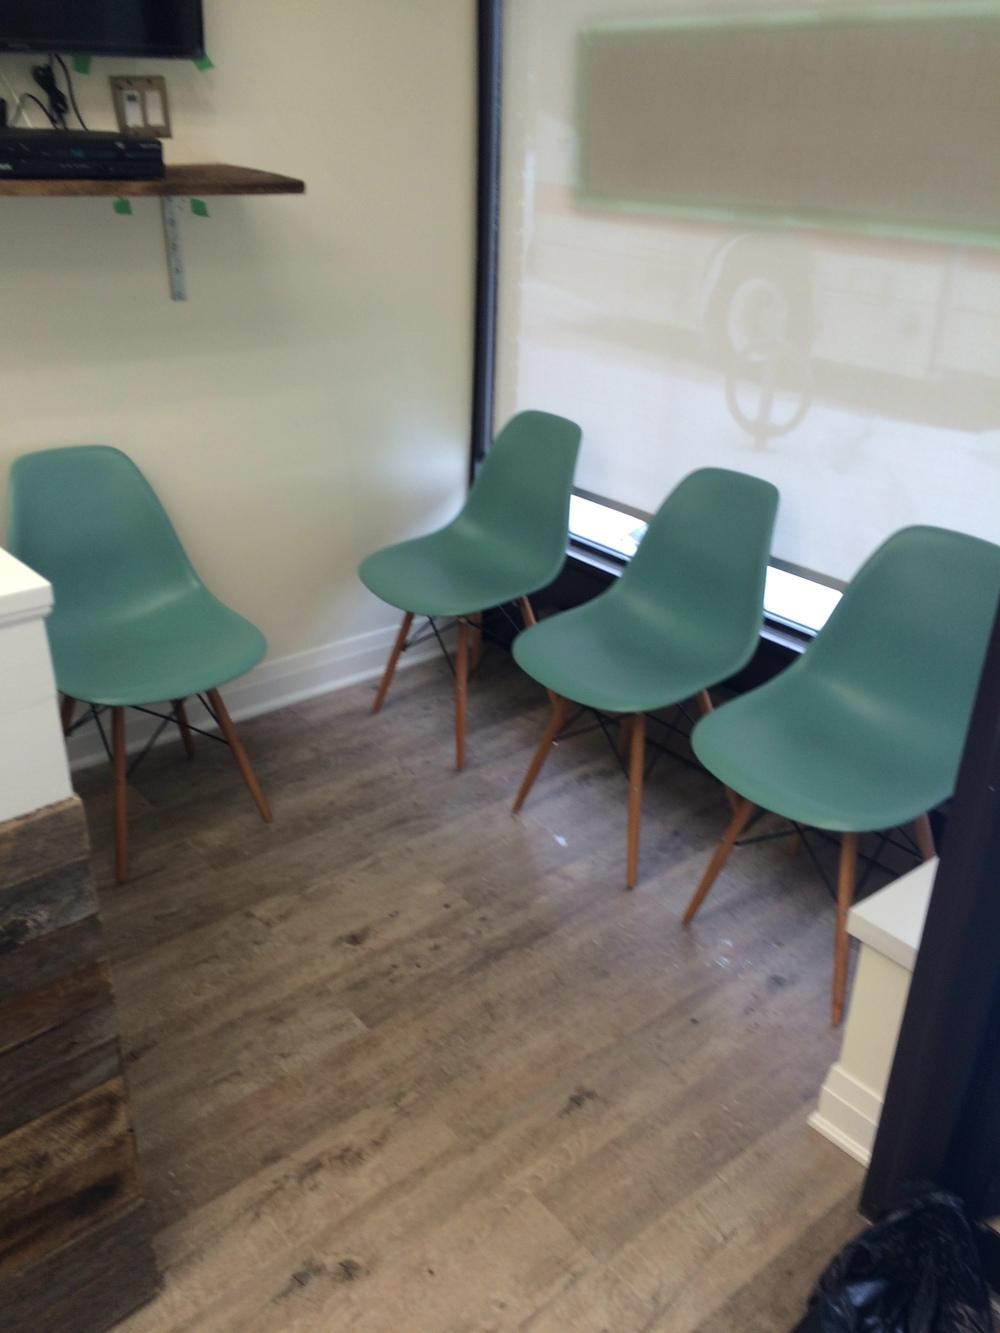 Salon Moda - Sitting room after.jpg